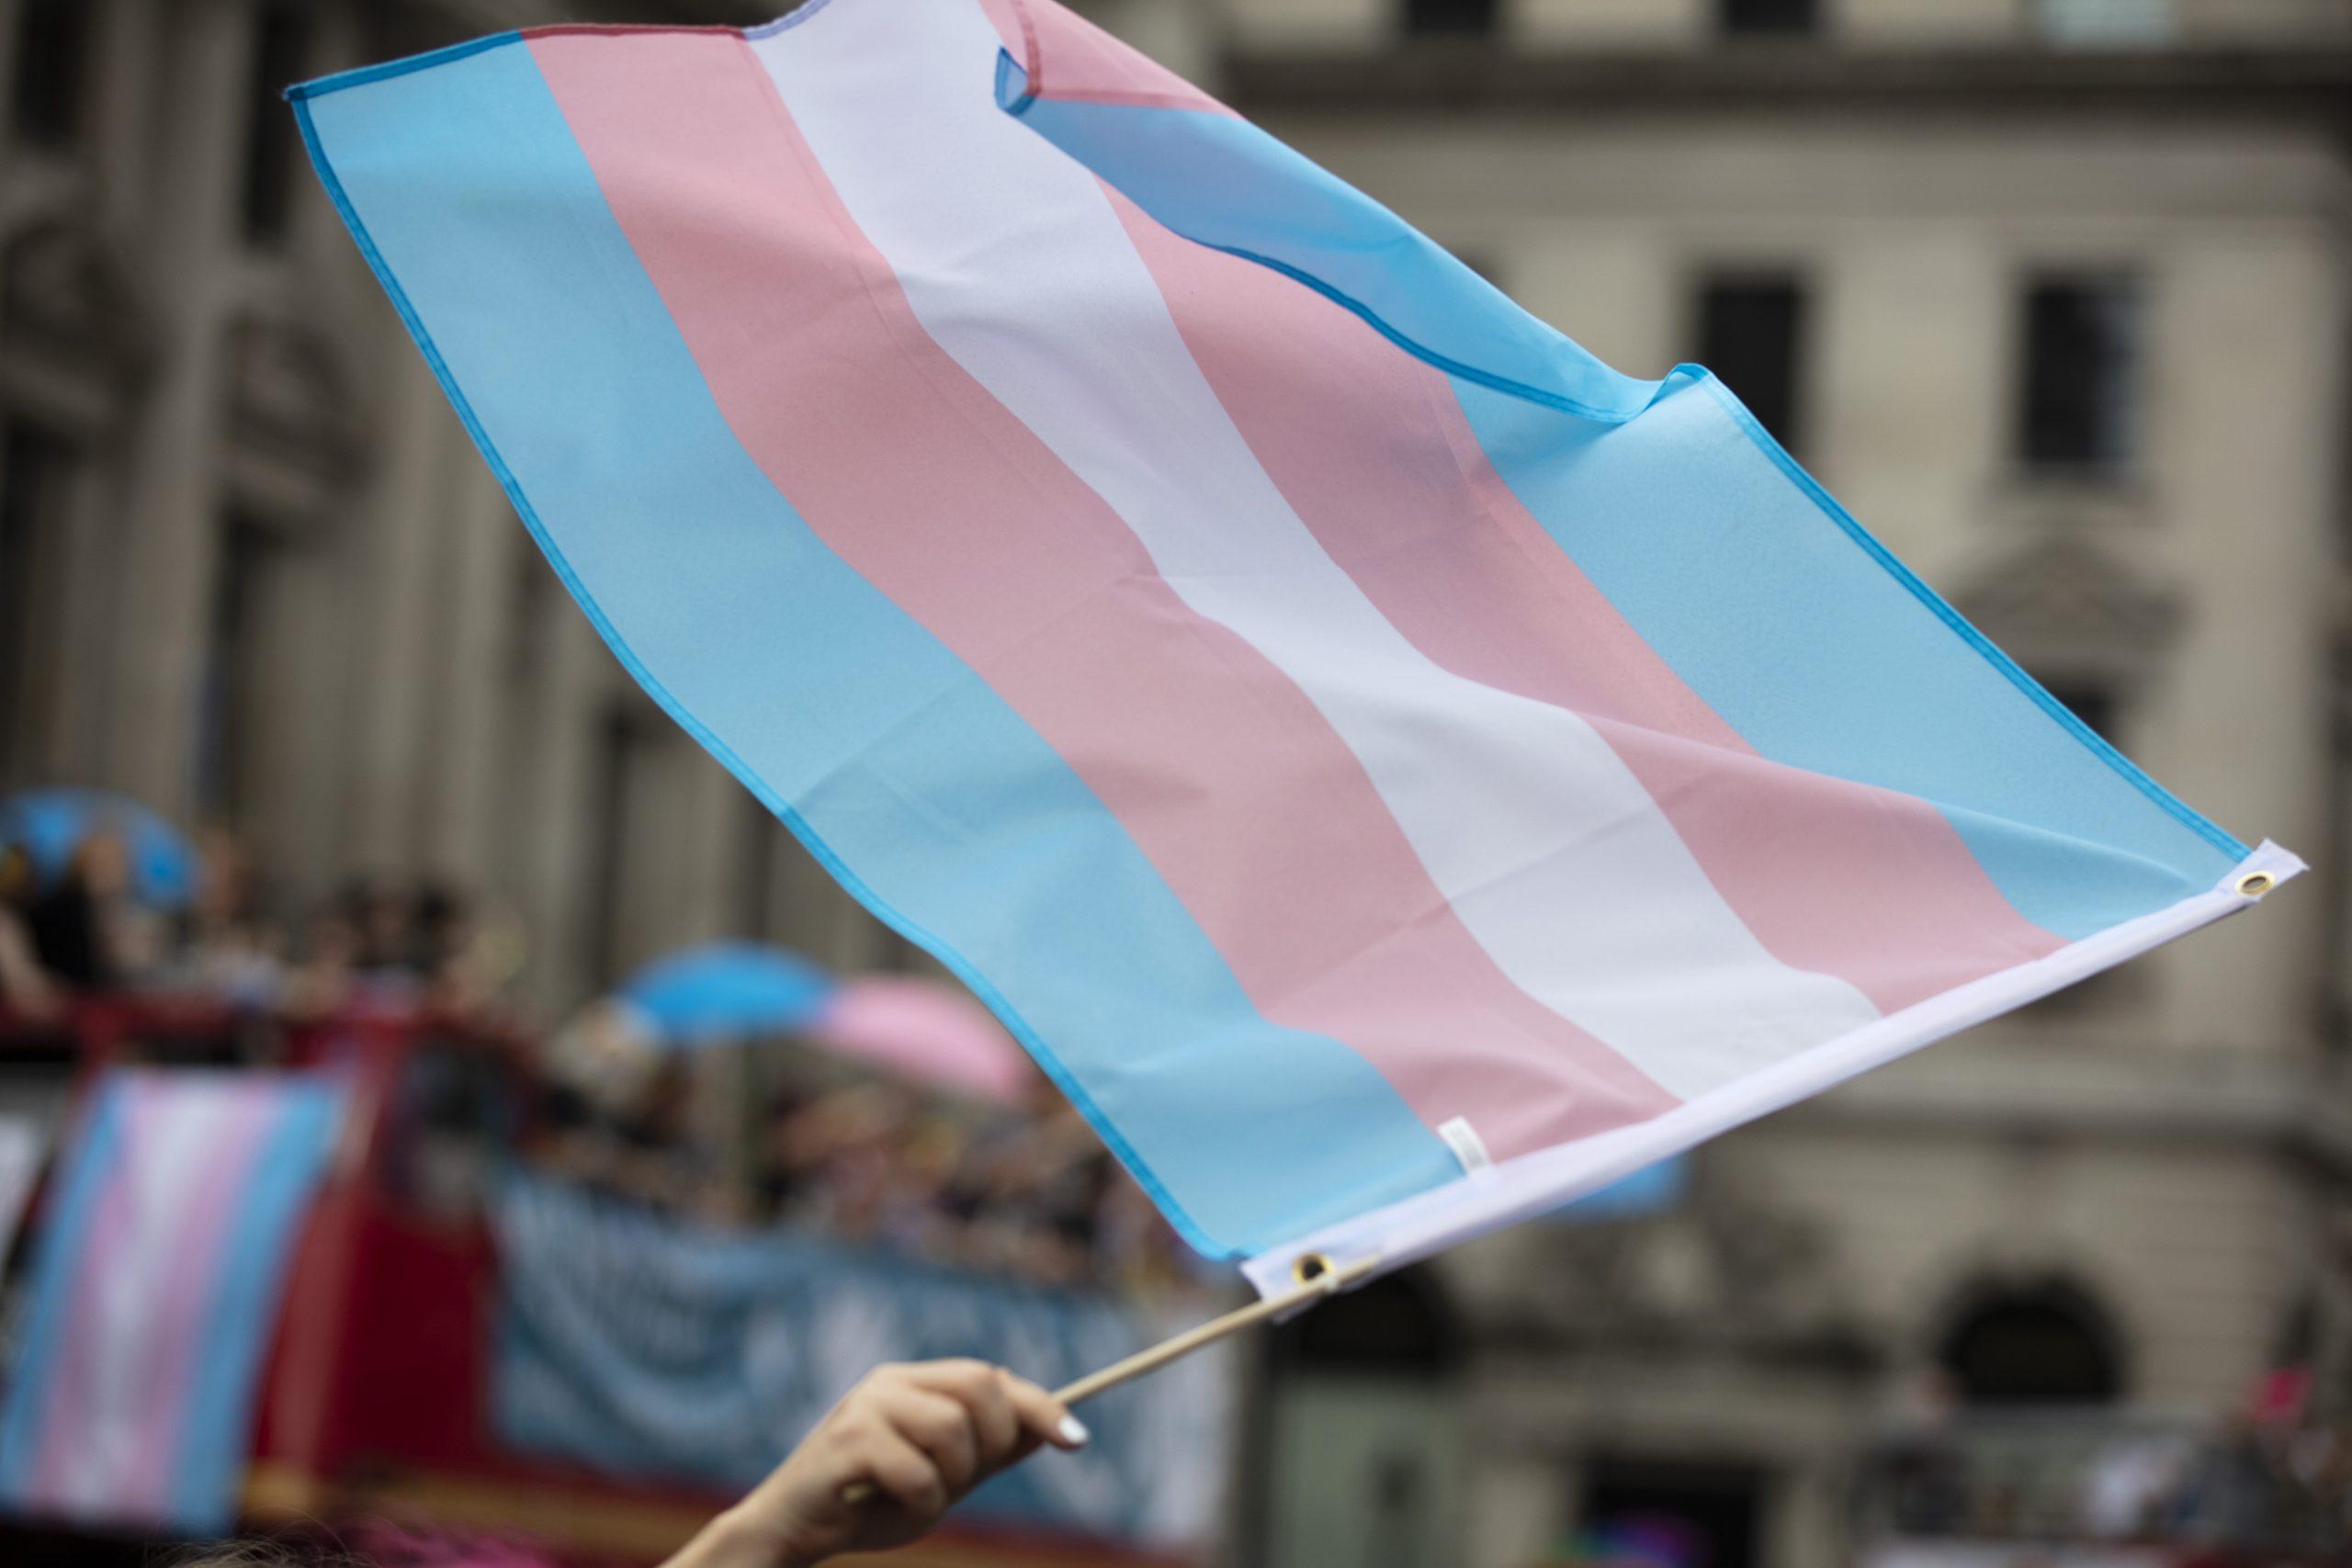 A transgender flag waved at LGBTQ Pride march